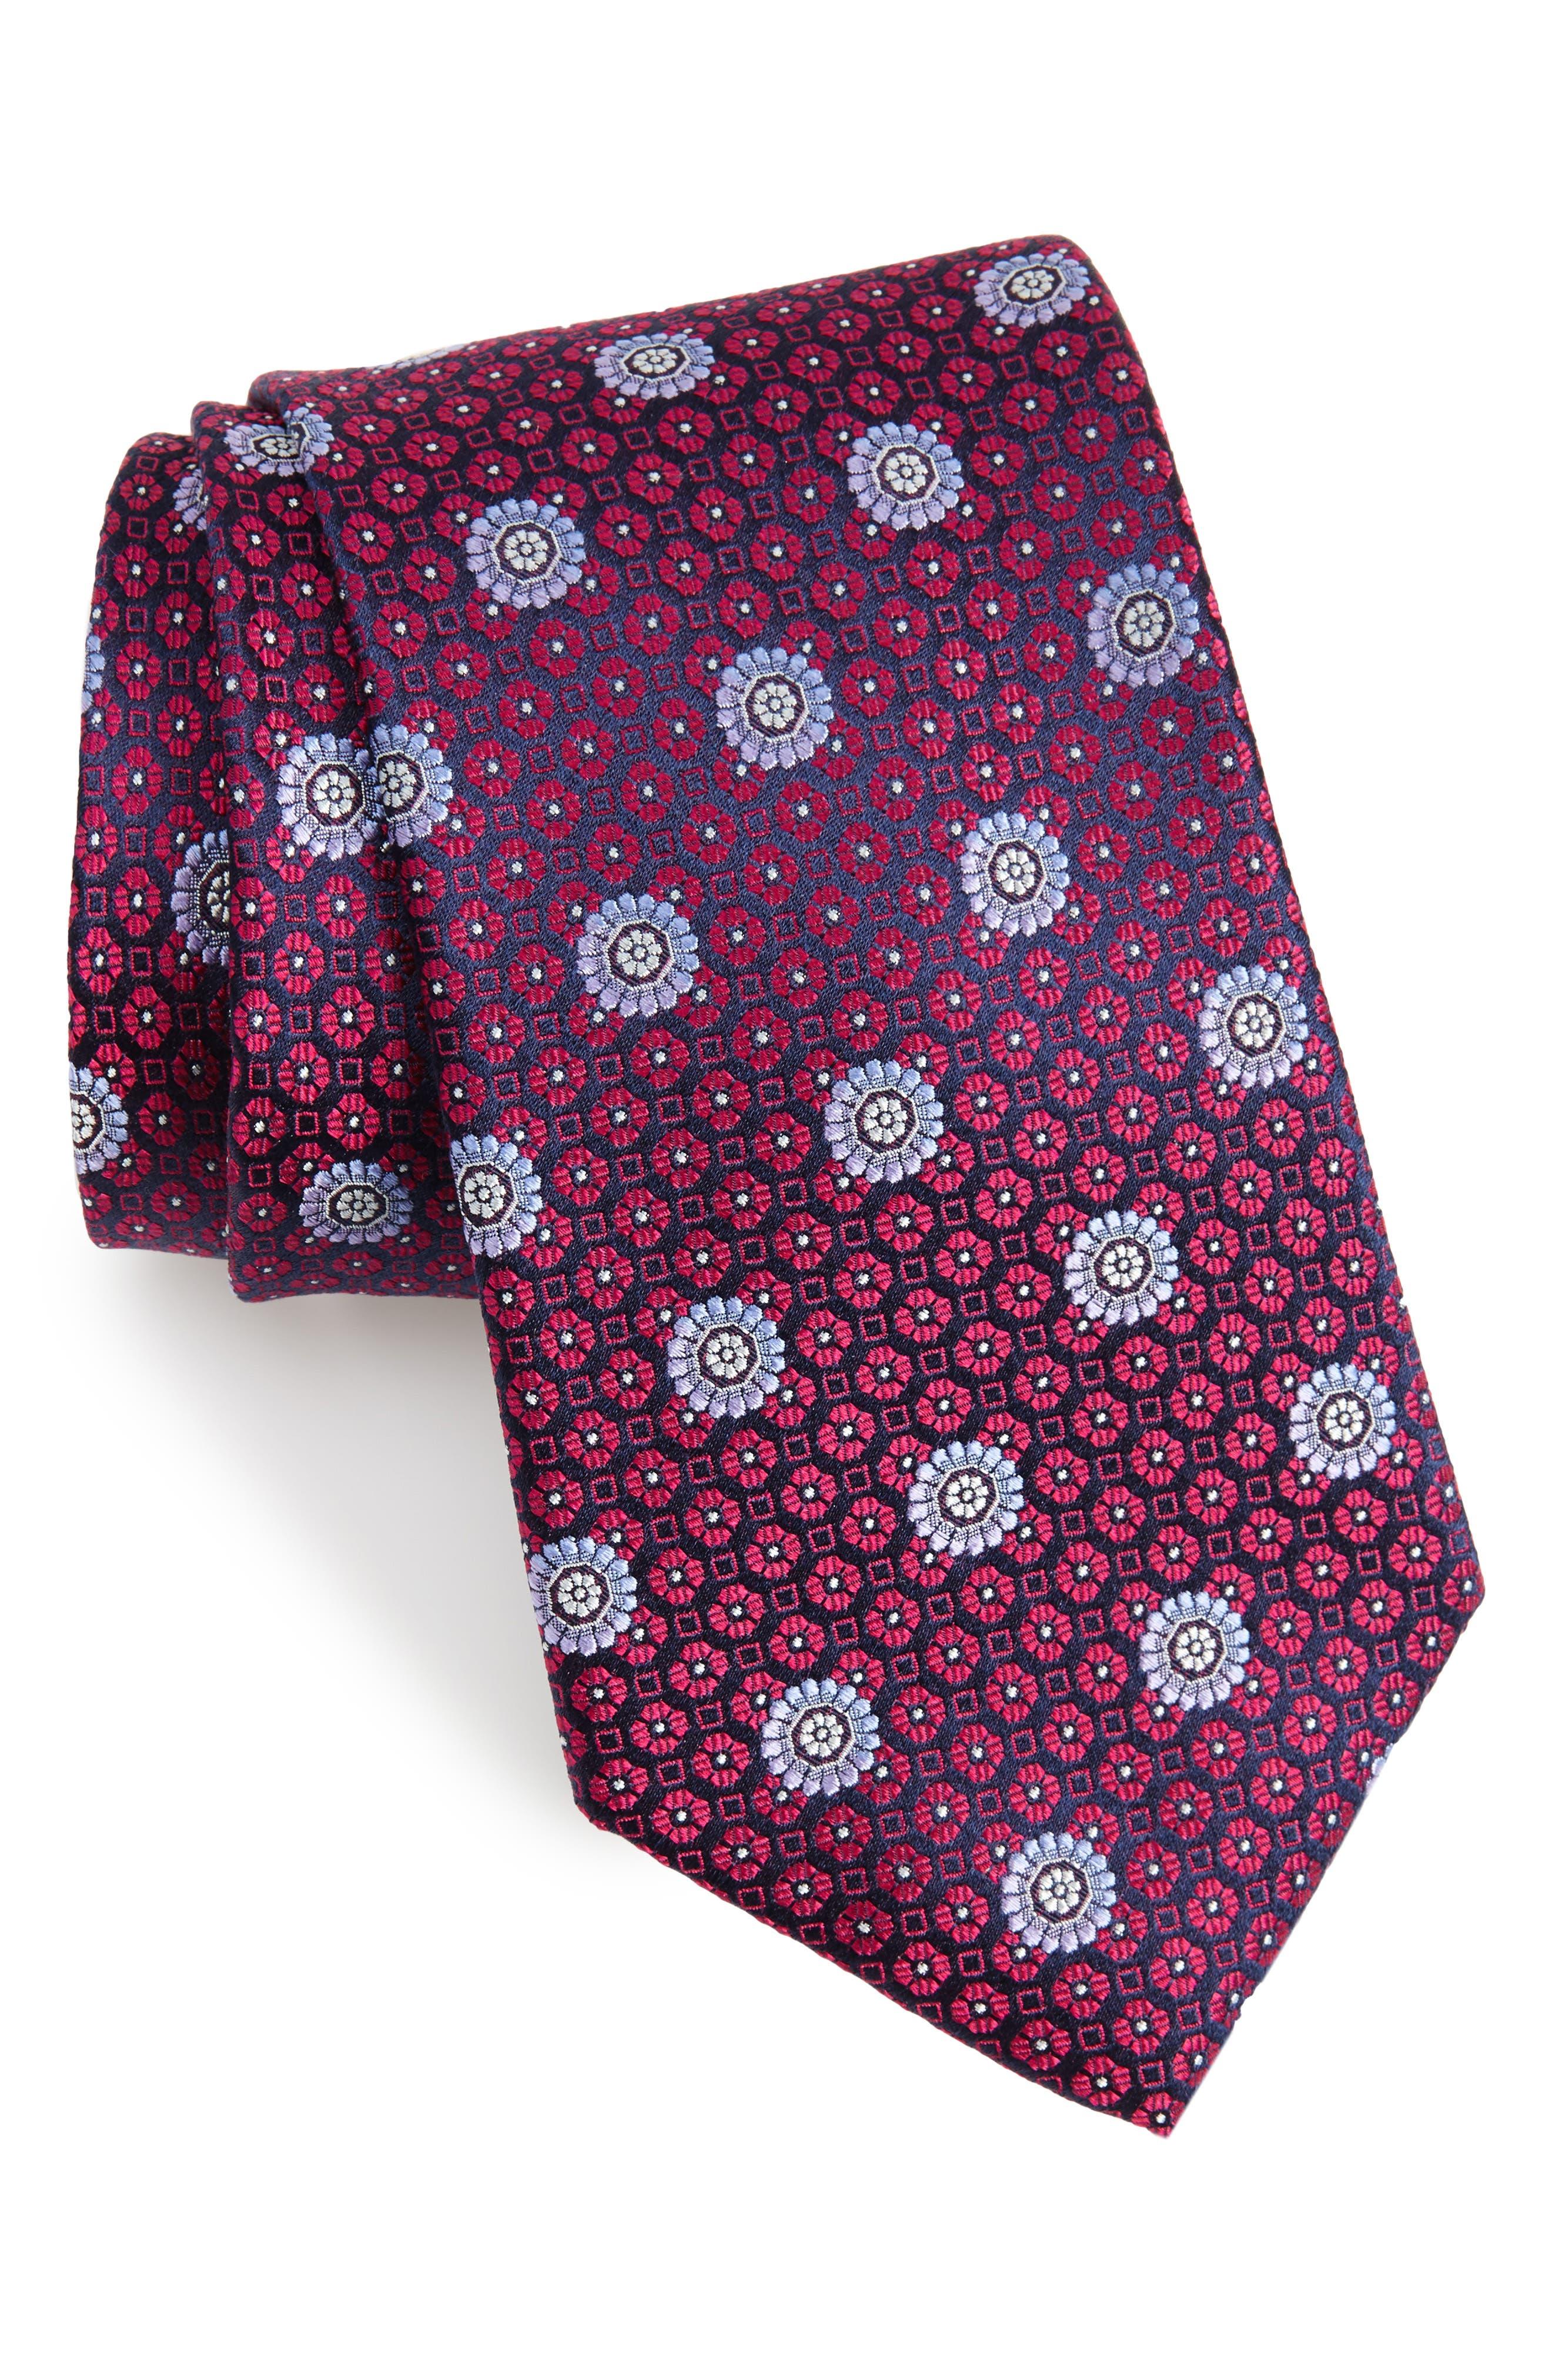 Nordstrom Men's Shop Regency Neat Medallion Silk Tie (X-Long)